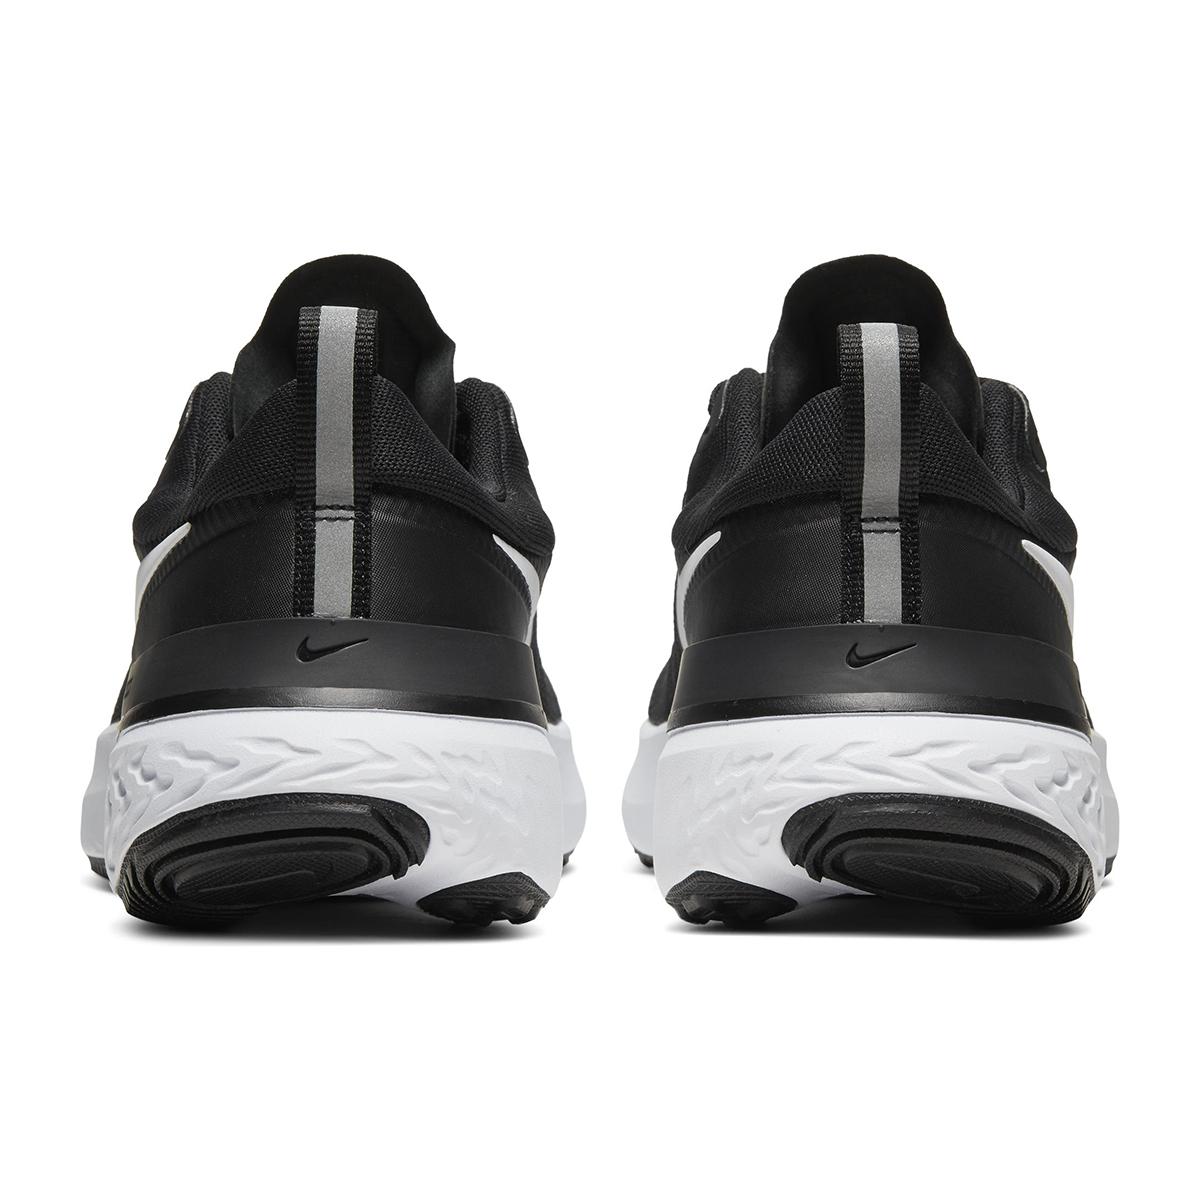 Women's Nike React Miler Running Shoe - Color: Black/Dark Grey/Anthracite/White (Regular Width) - Size: 5, Black/Dark Grey/Anthracite/White, large, image 3